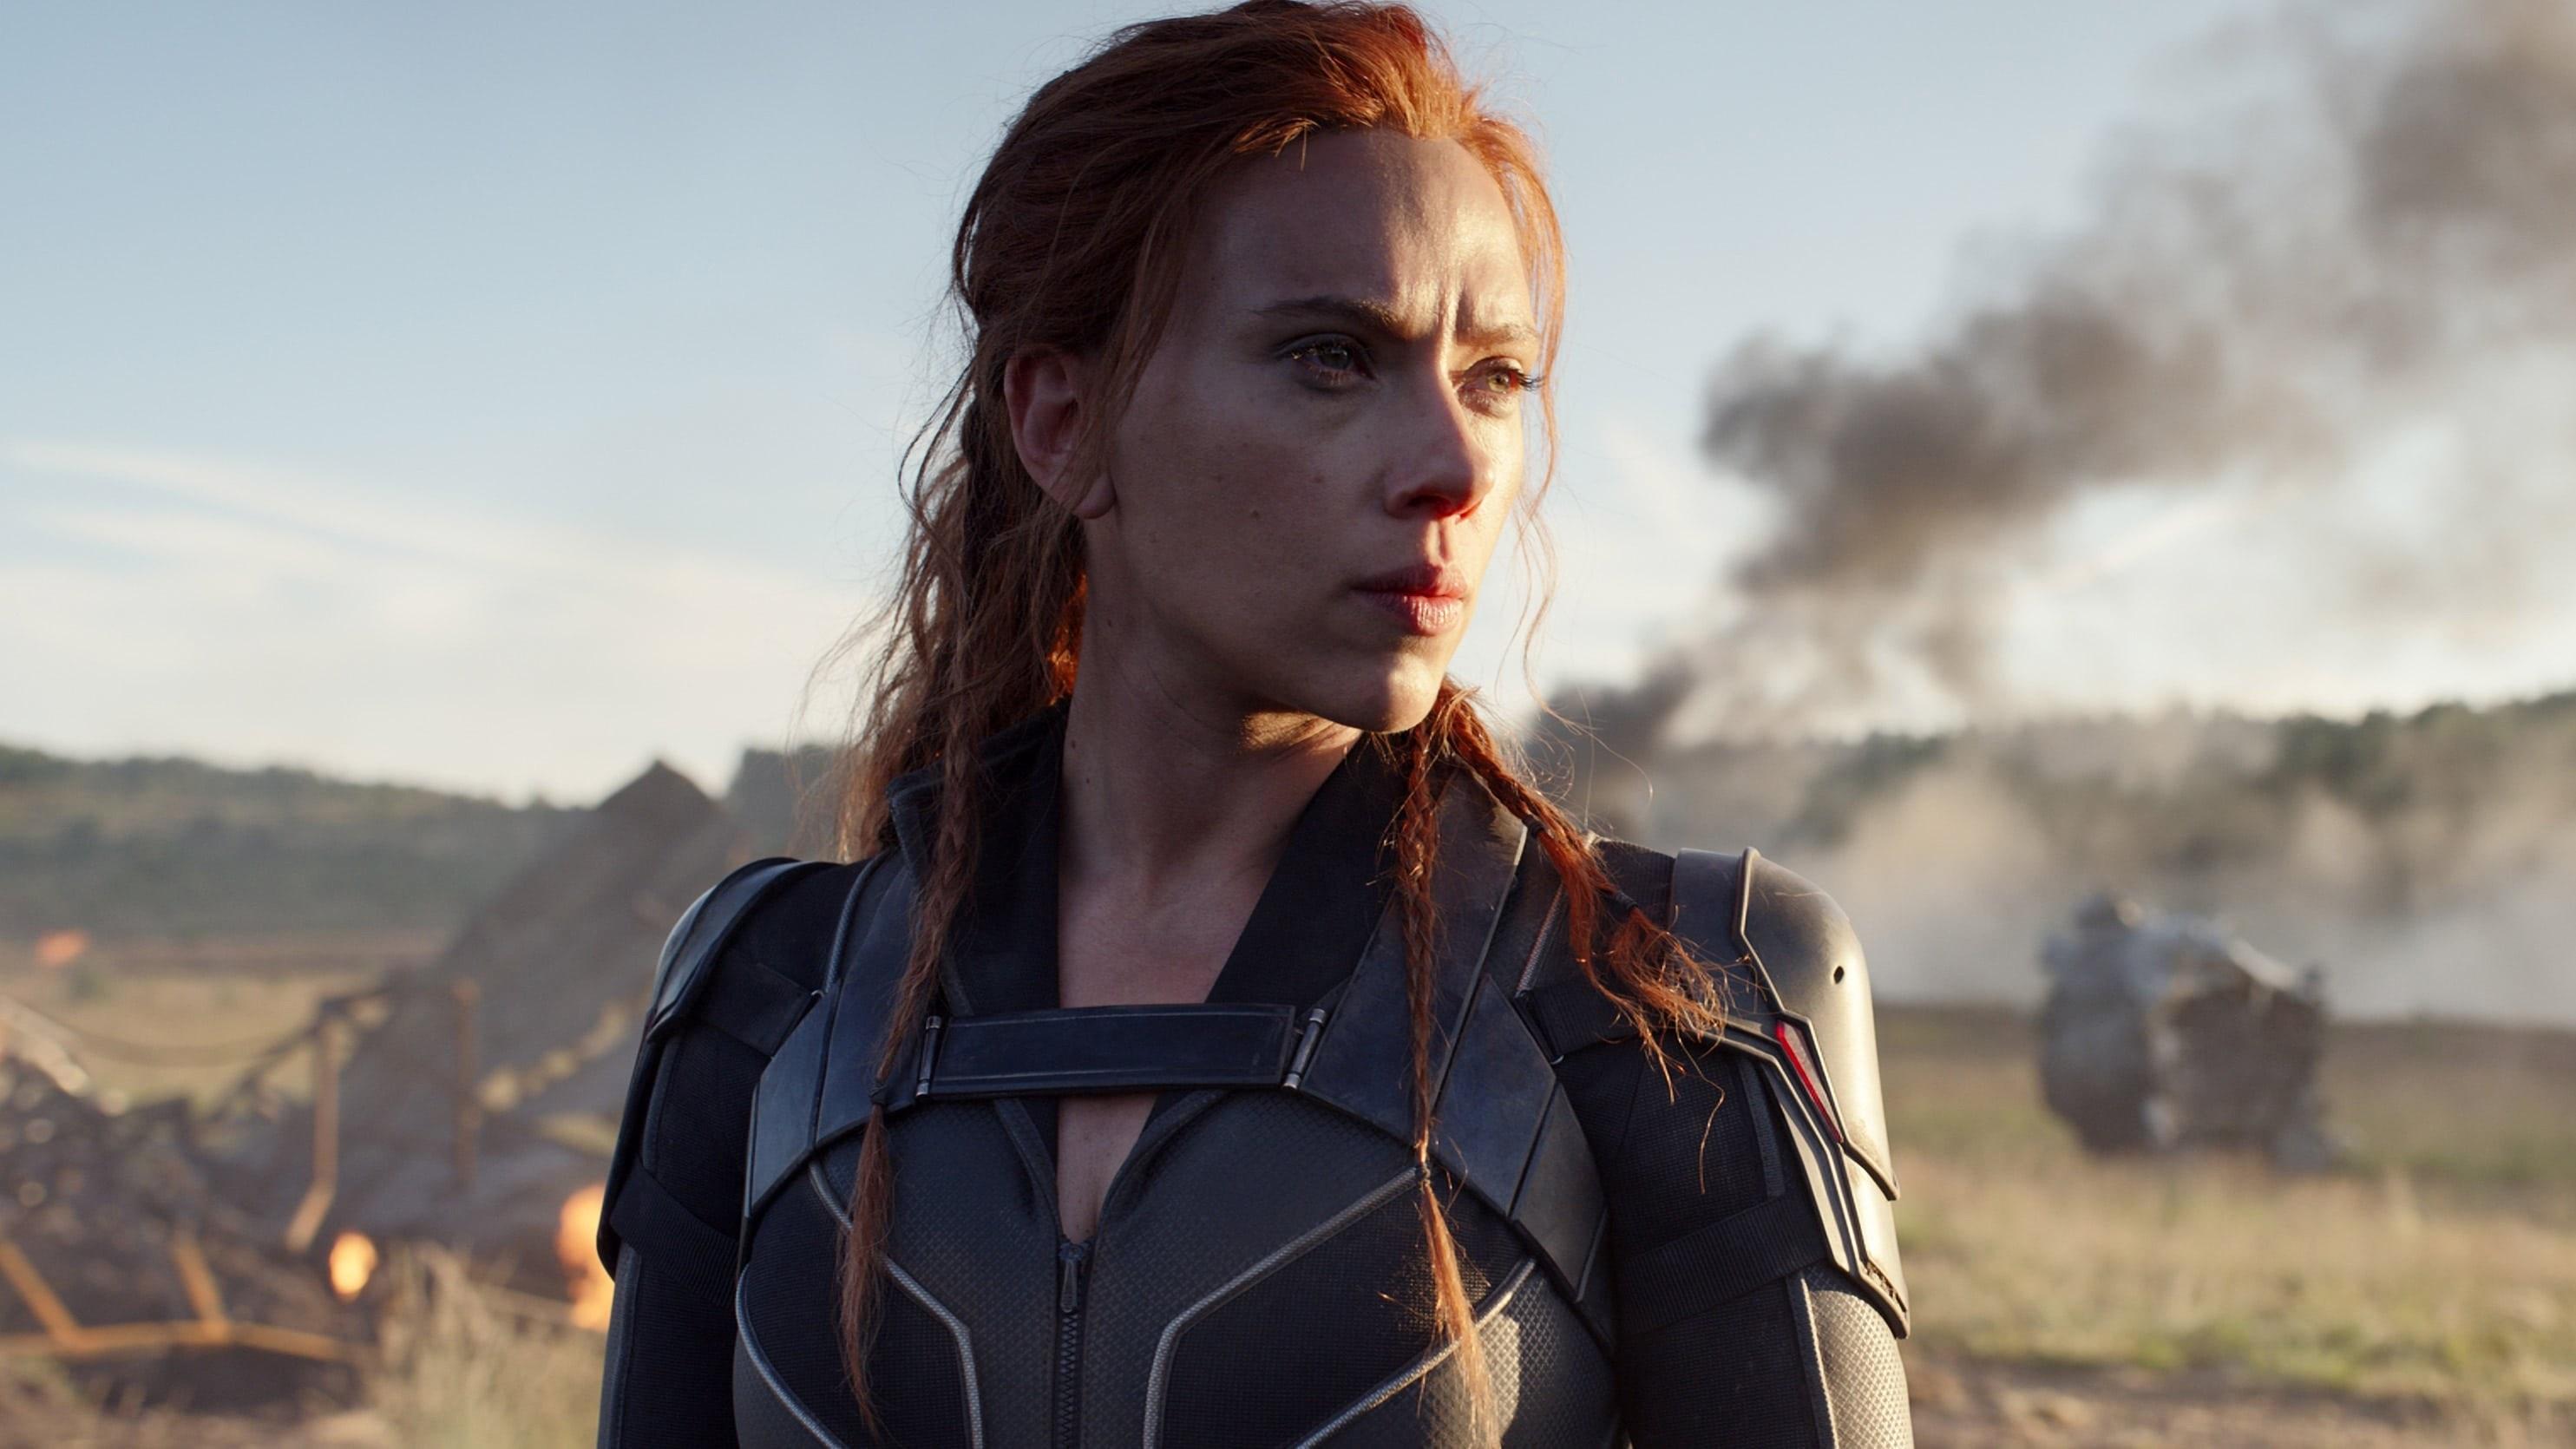 Scarlett Johansson looking away mysteriously